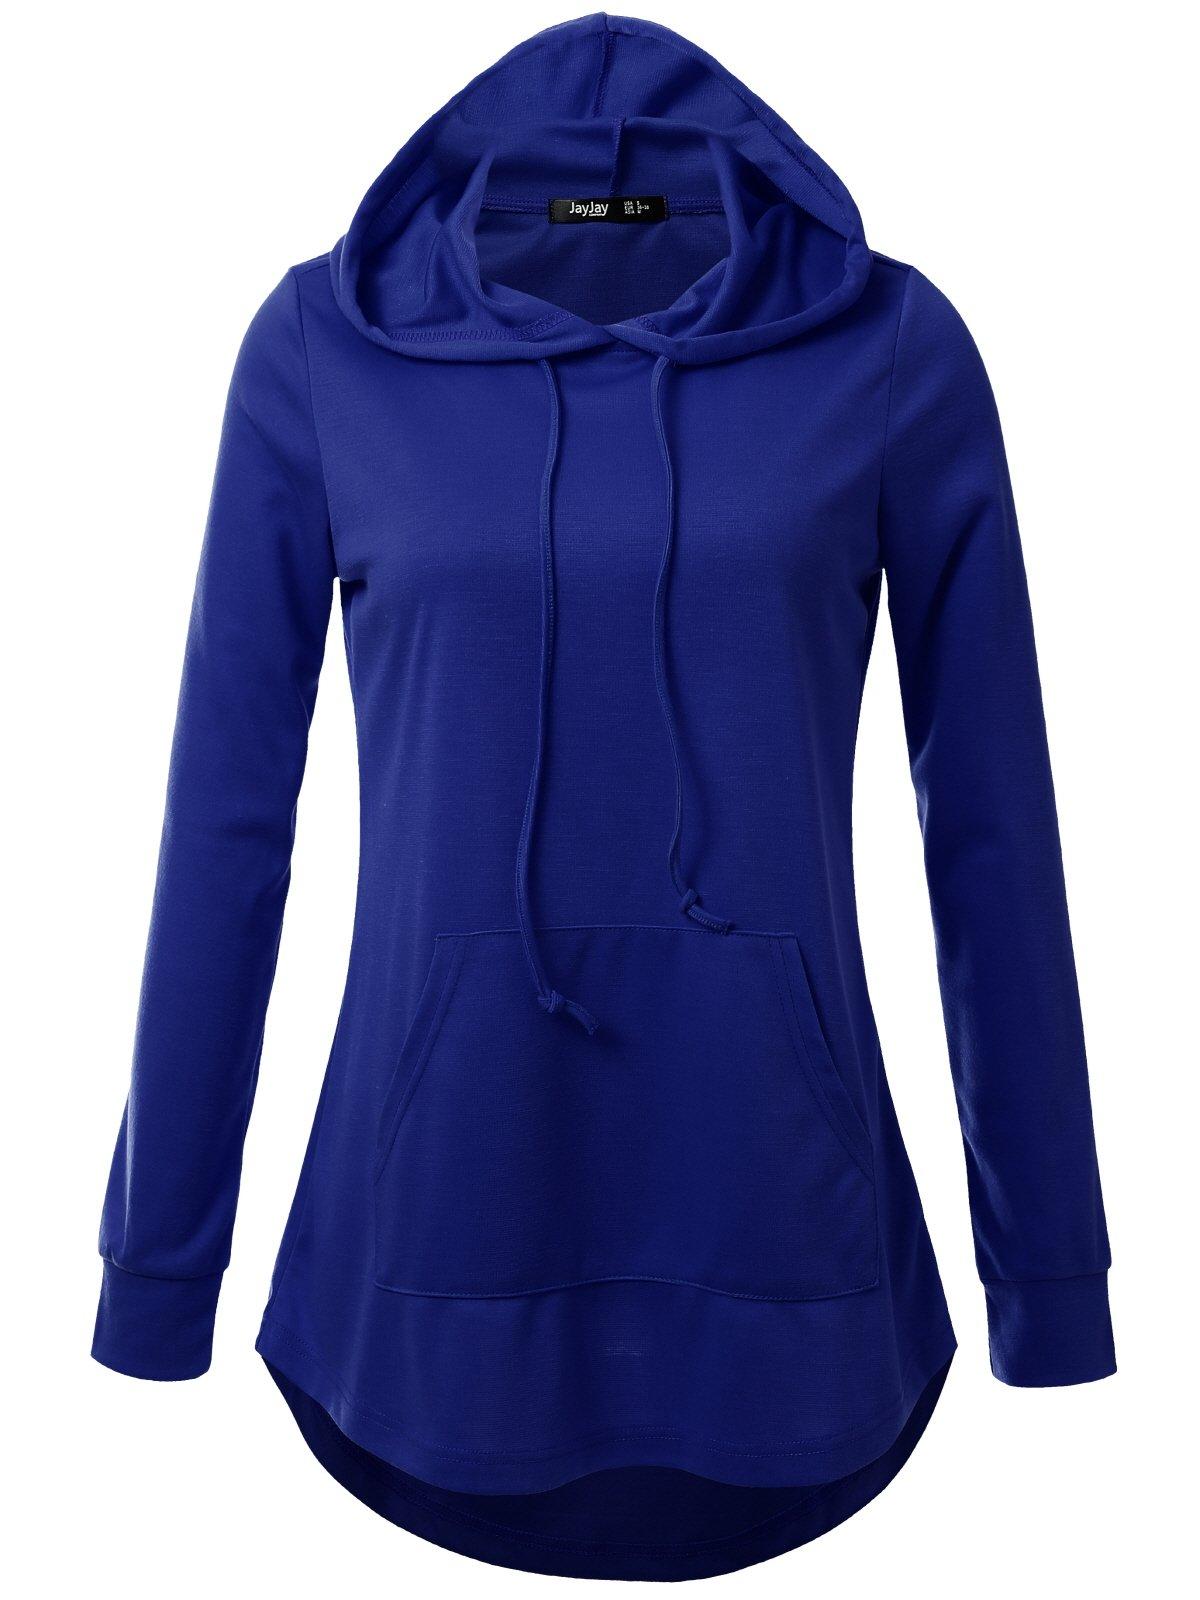 JayJay Women High Low Sweat Casual Long Sleeve Hoodie Lightweight Sweatshirt,Royalblue,XL